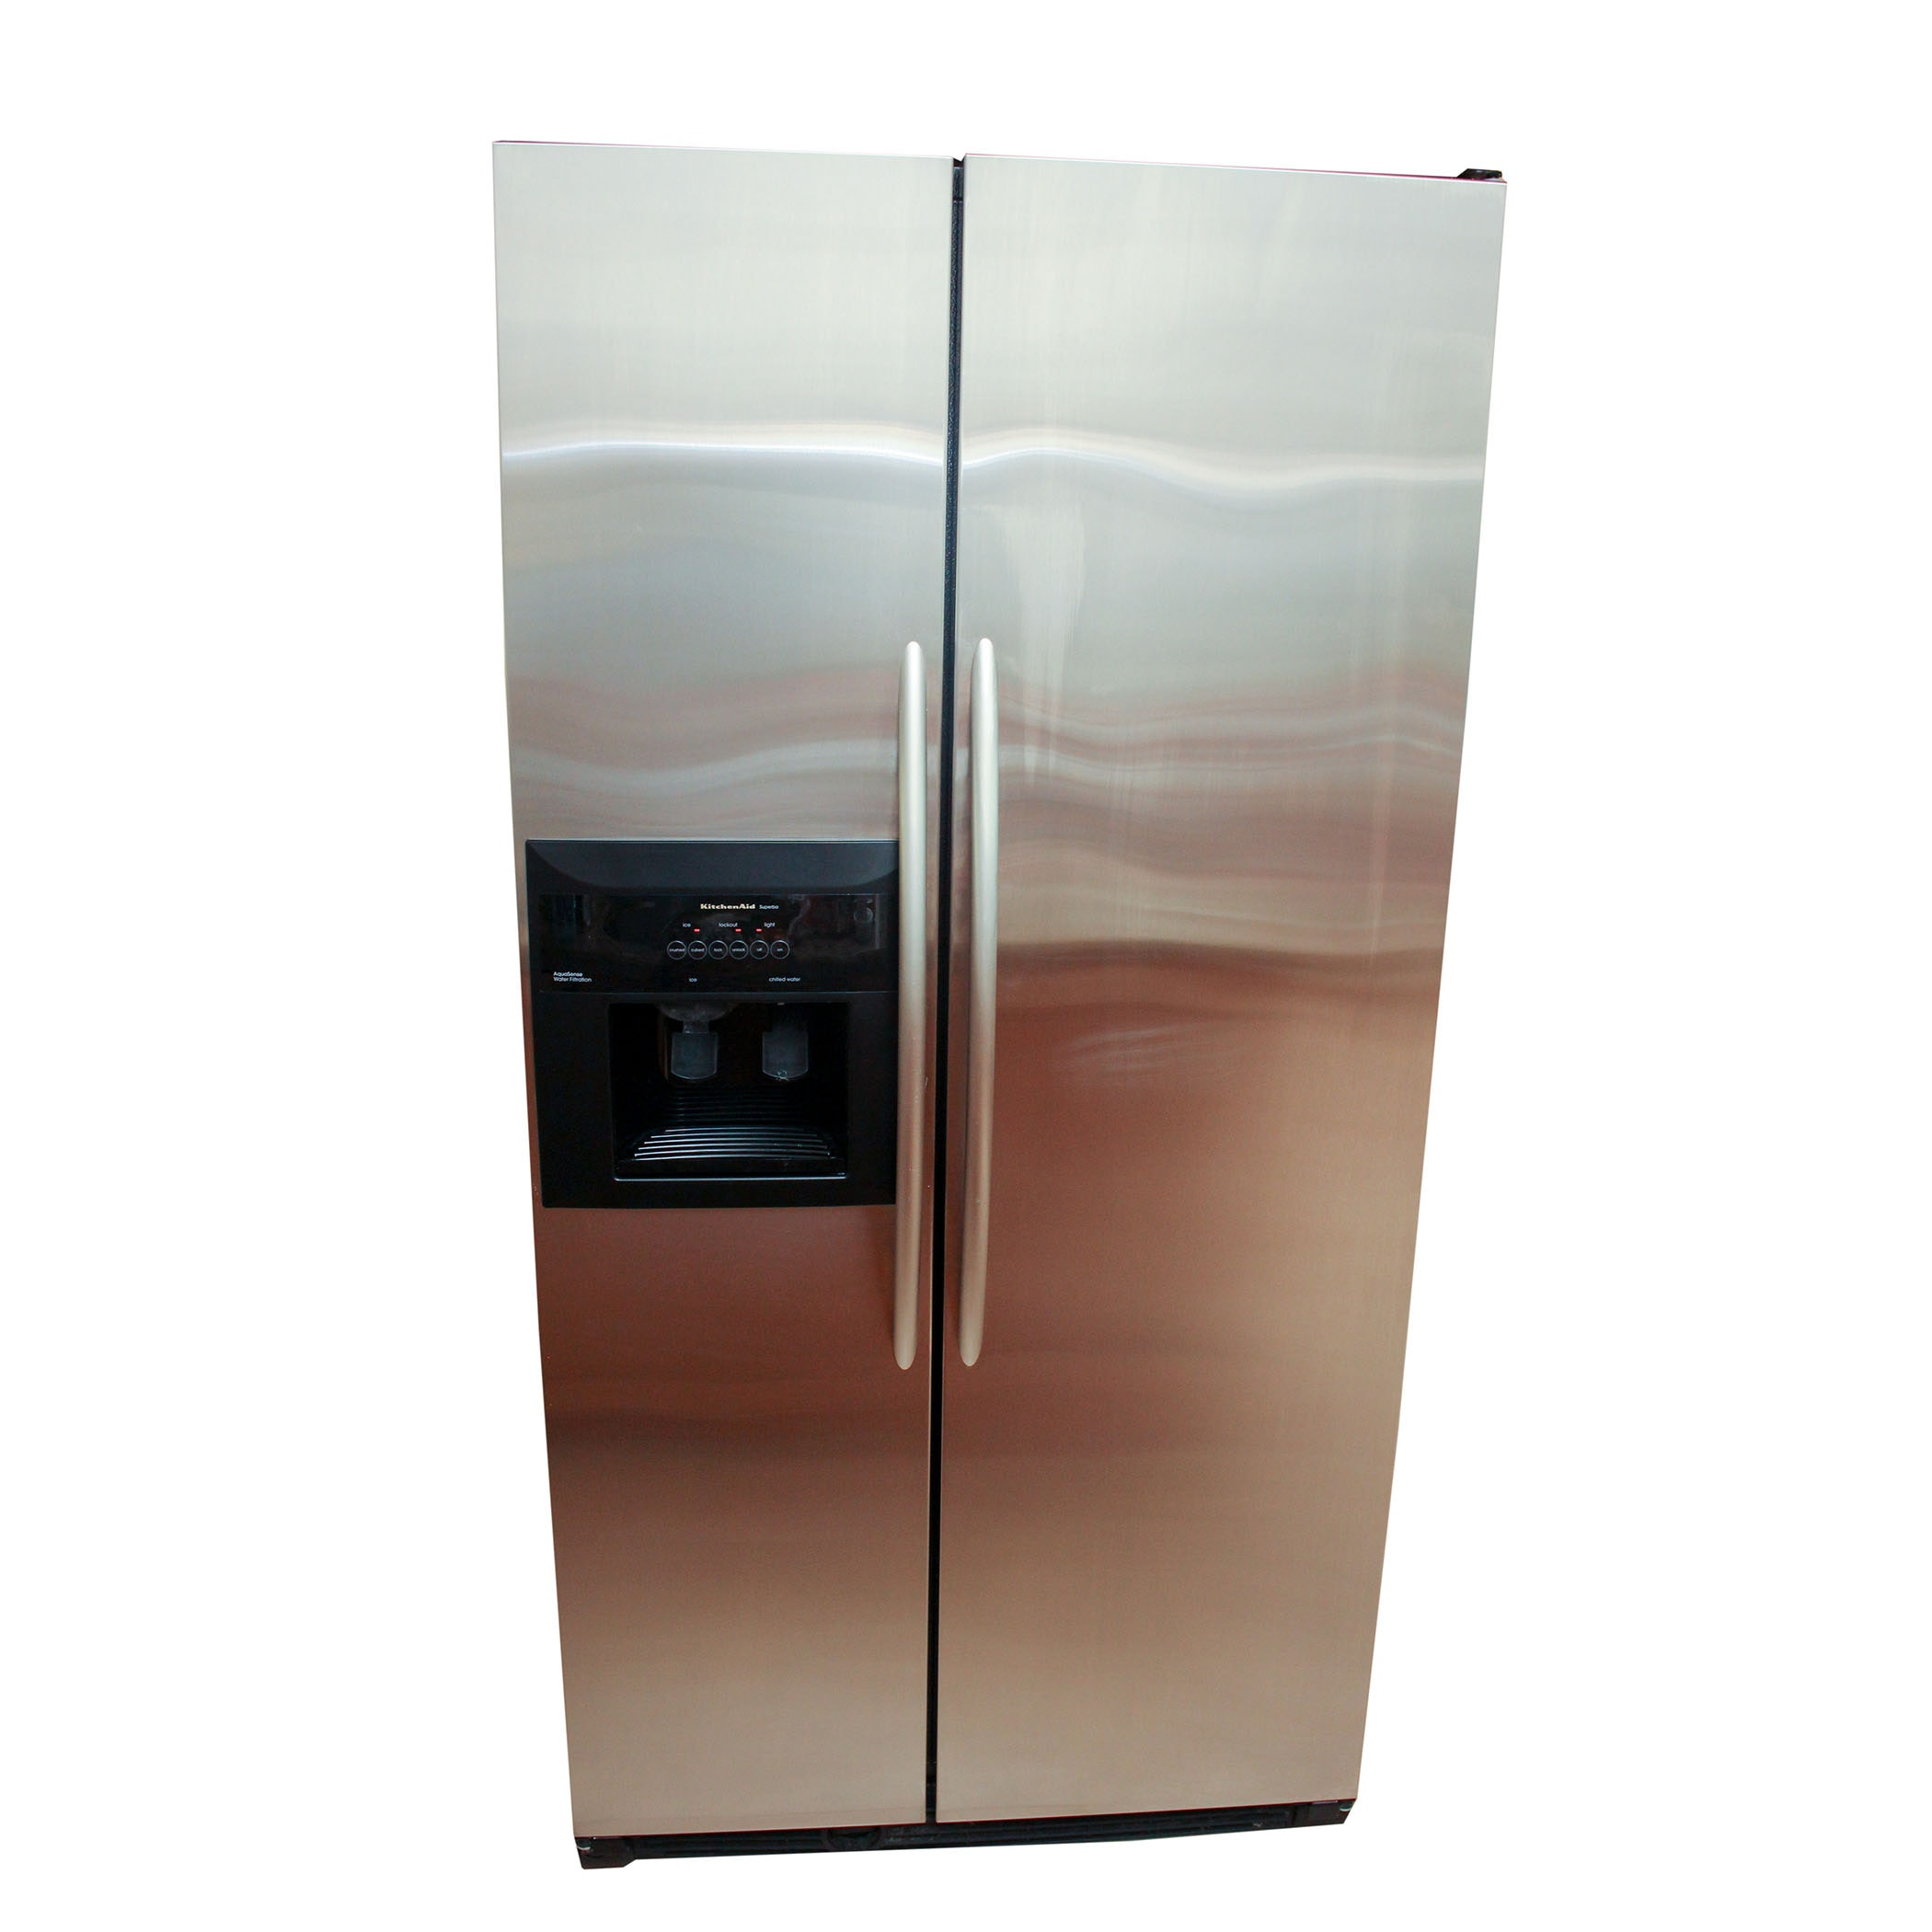 Kitchenaid Refrigerator Superba kitchenaid superba chrome refrigerator : ebth